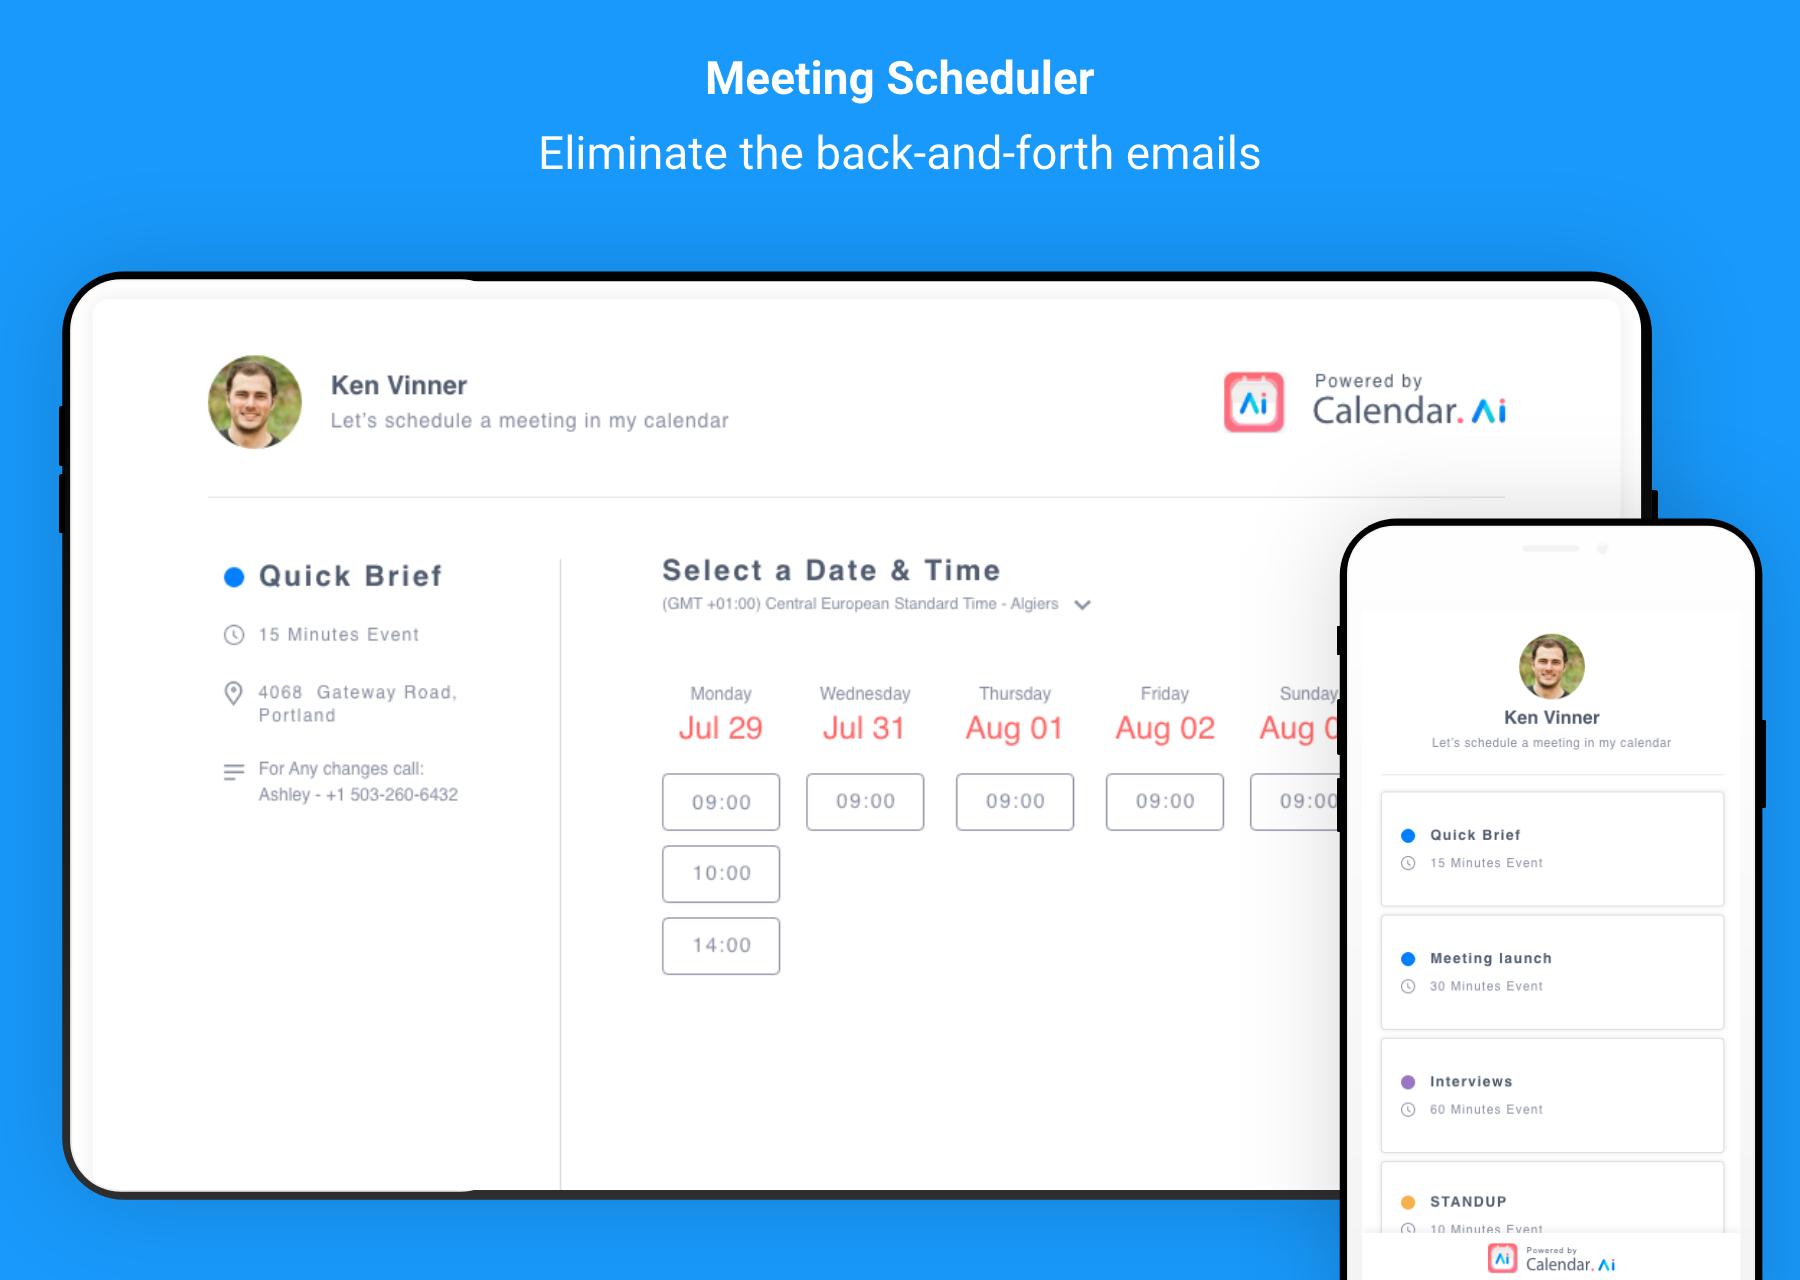 Calendar.AI Product Hunt Image